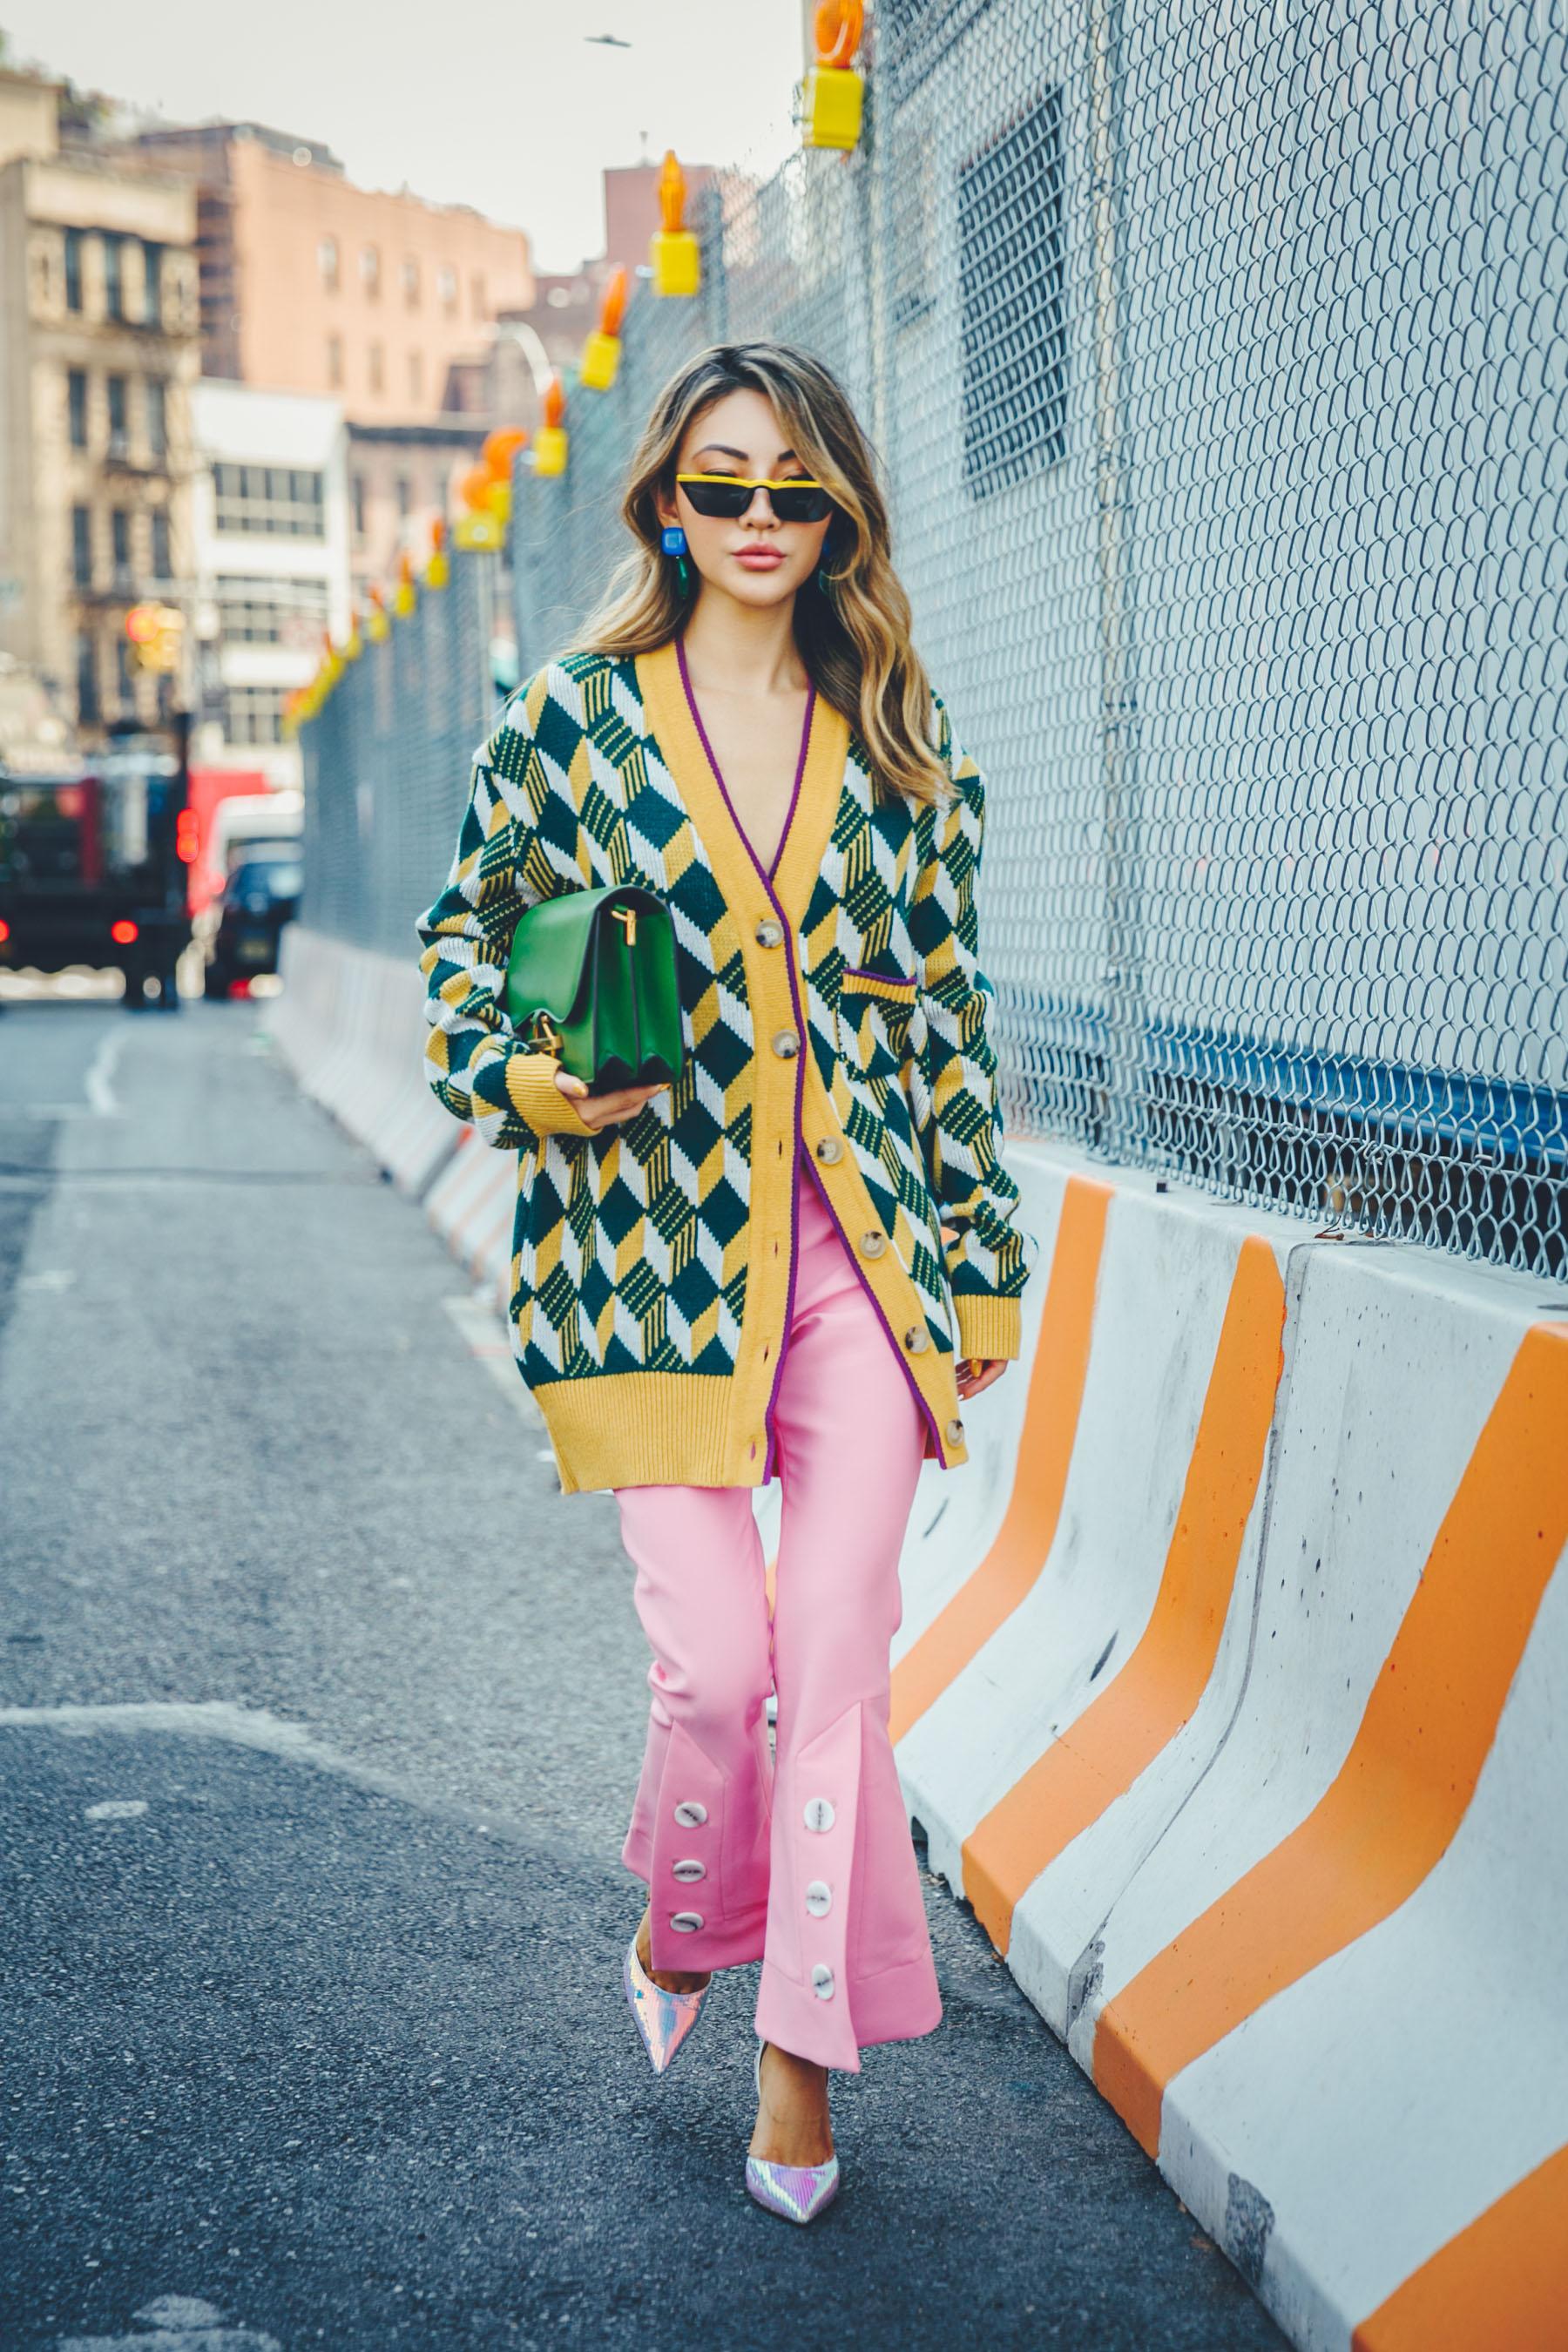 back to school outfits, NYFW SS19 Recap, NYFW SS19 Street Style, oversized cardigan trend, argyle cardigan // Notjessfashion.com